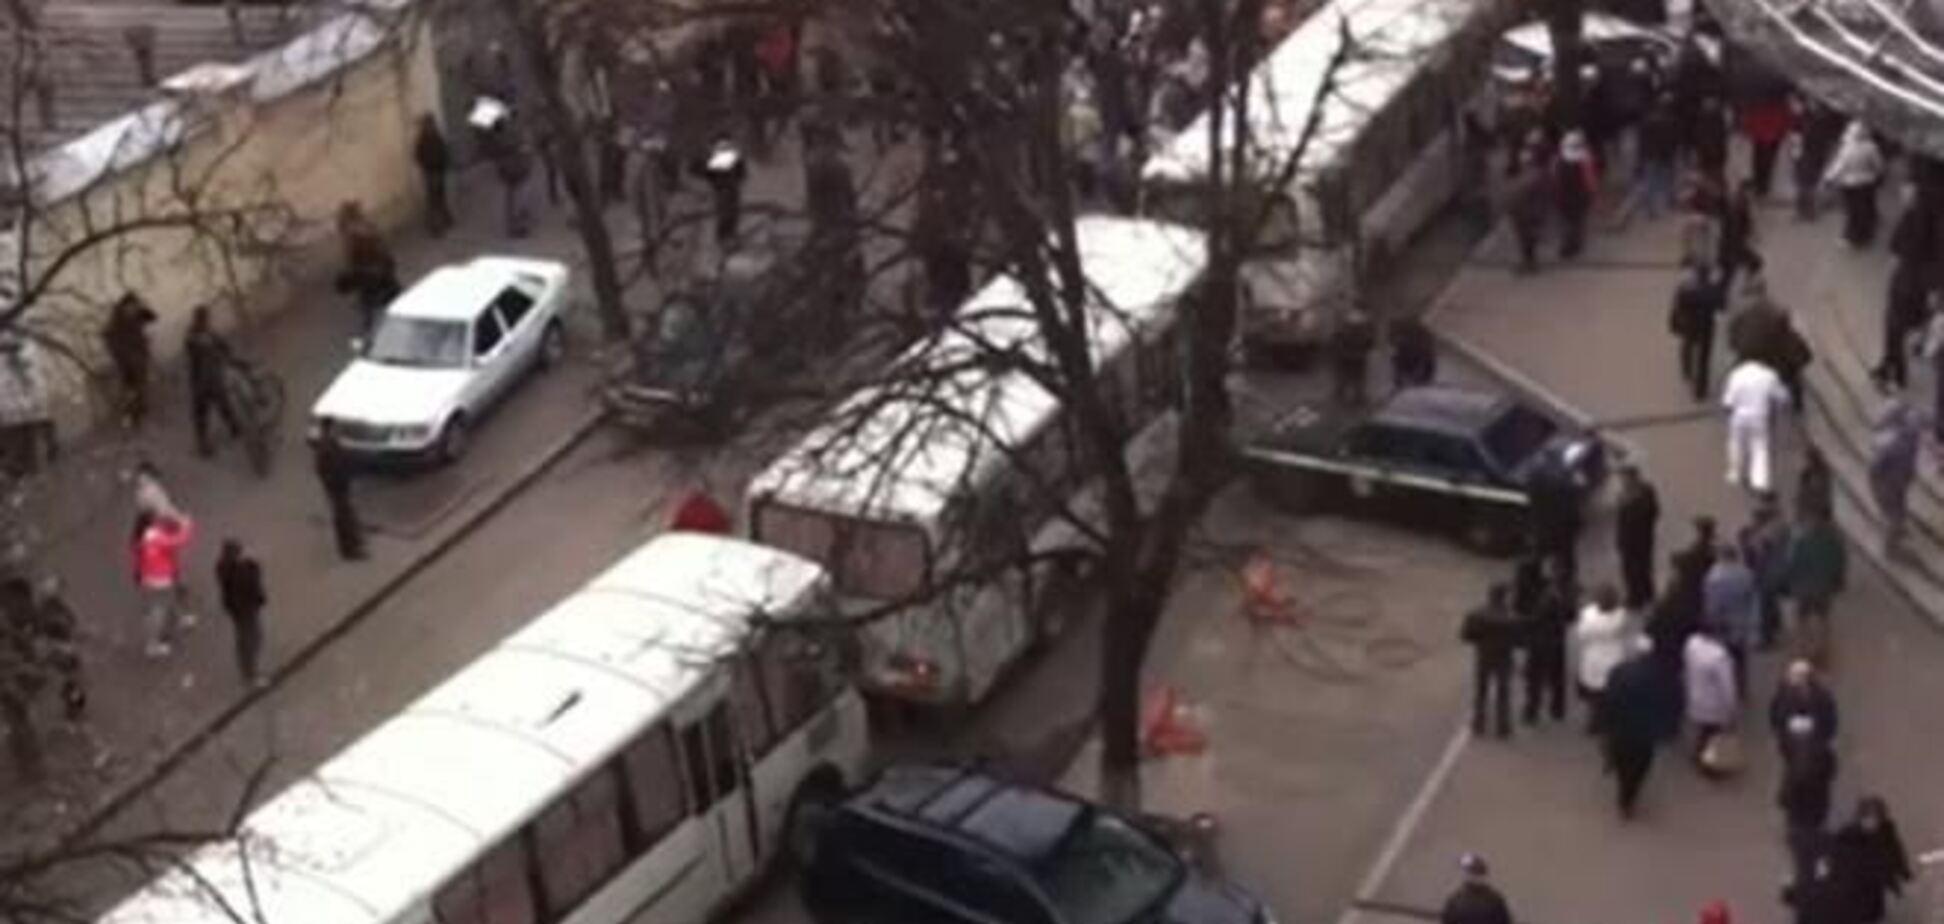 МВД начало расследование нападения сепаратистами на милицейский автобус